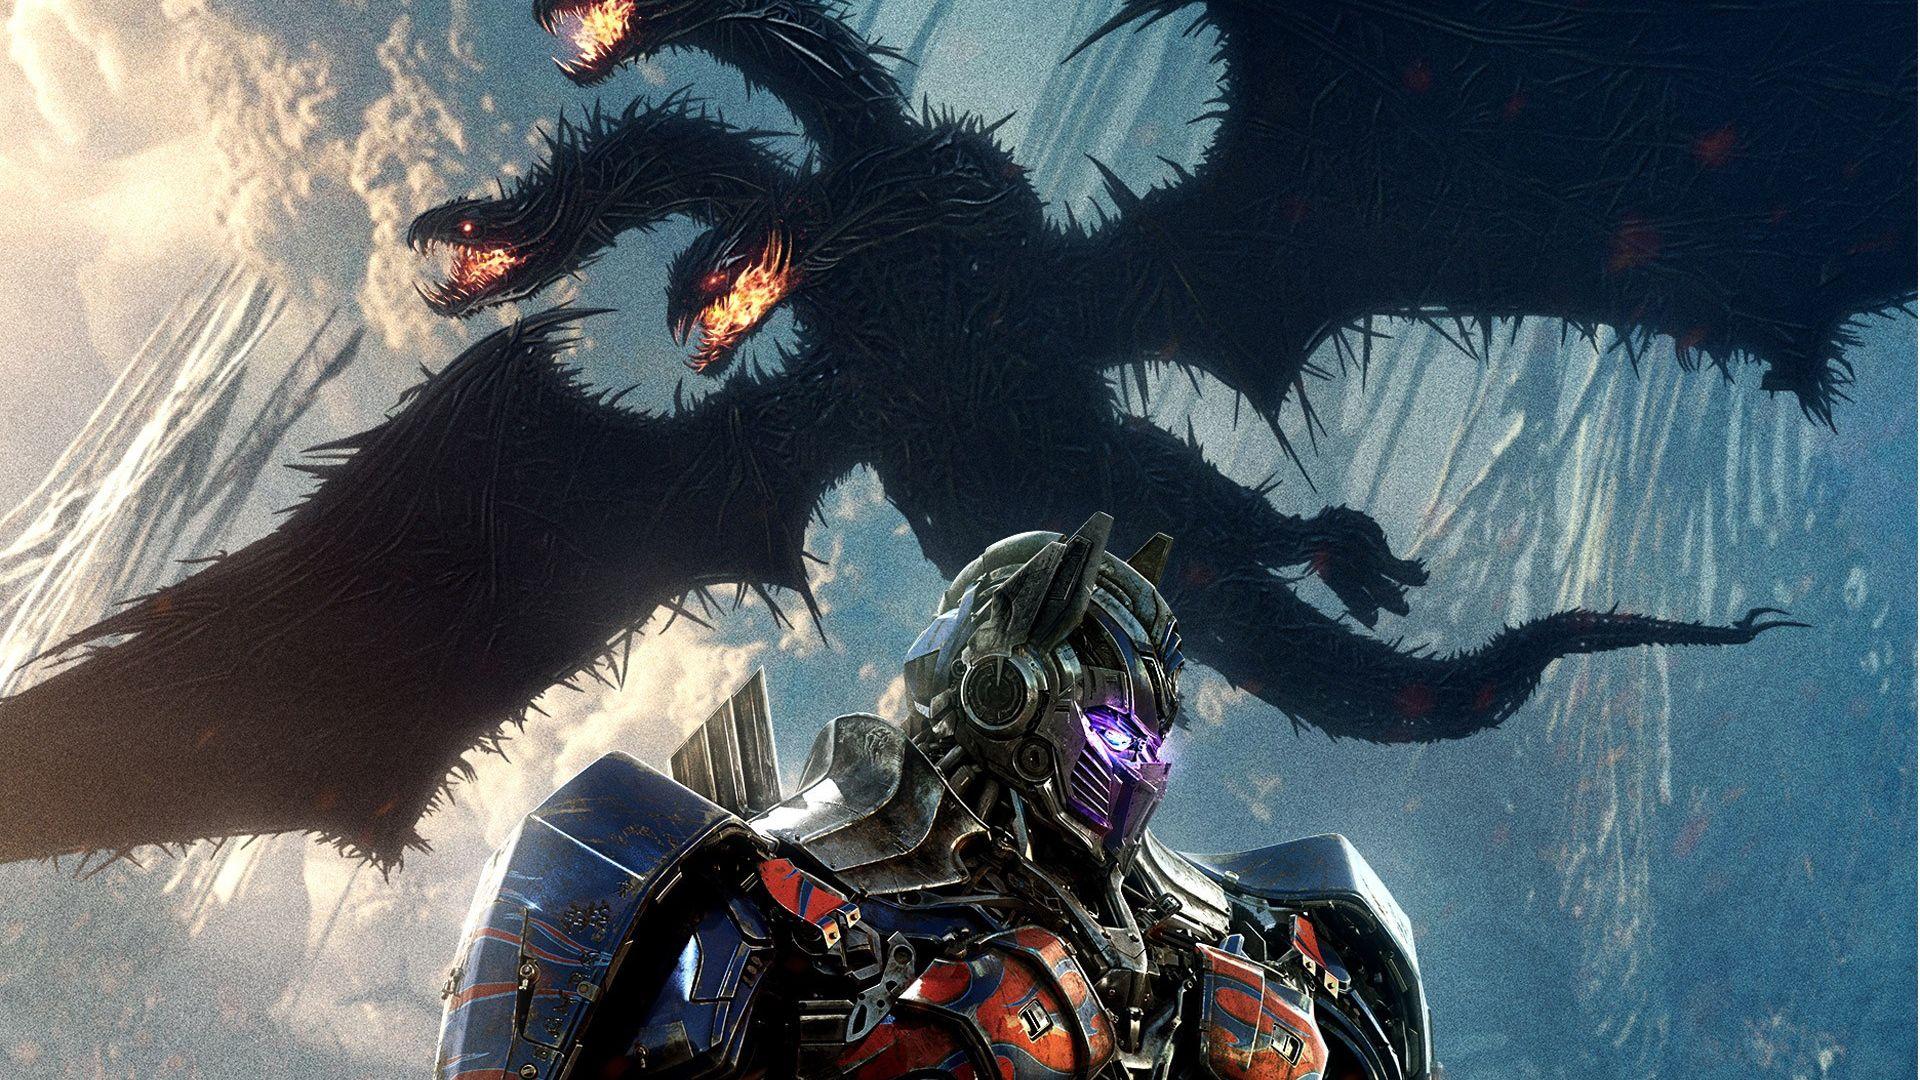 Wallpaper Dragon, Optimus Prime, Transformers: The Last Knight, movie